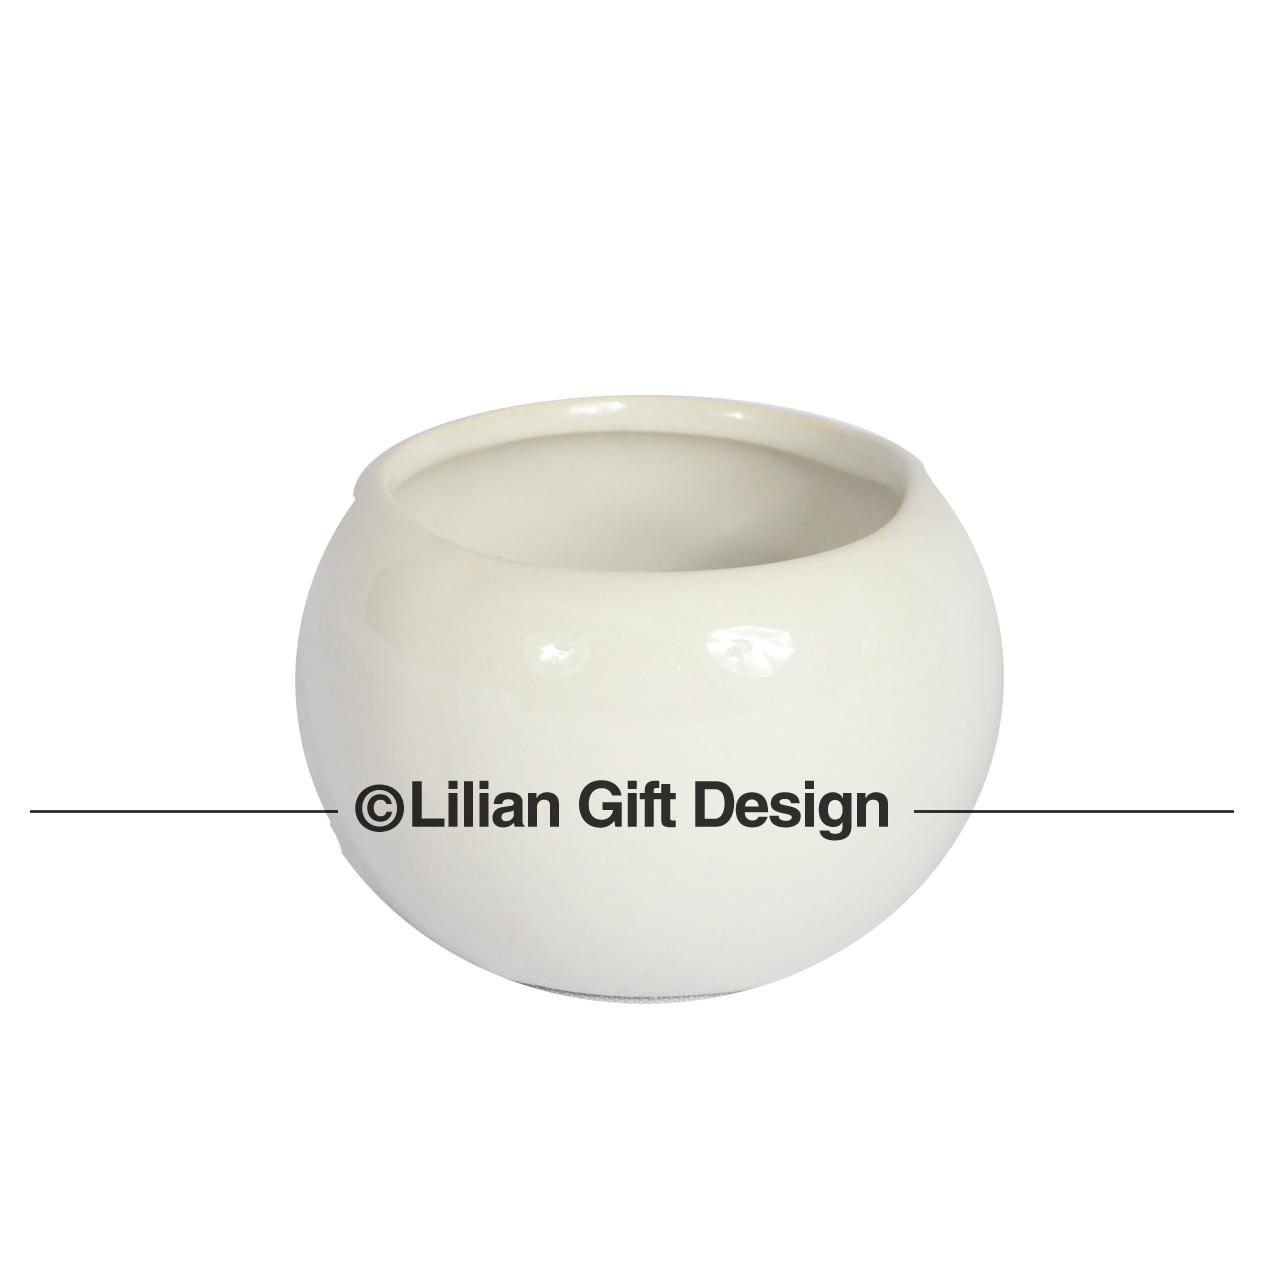 Vaso cerâmica branco 4.5x4.5cm